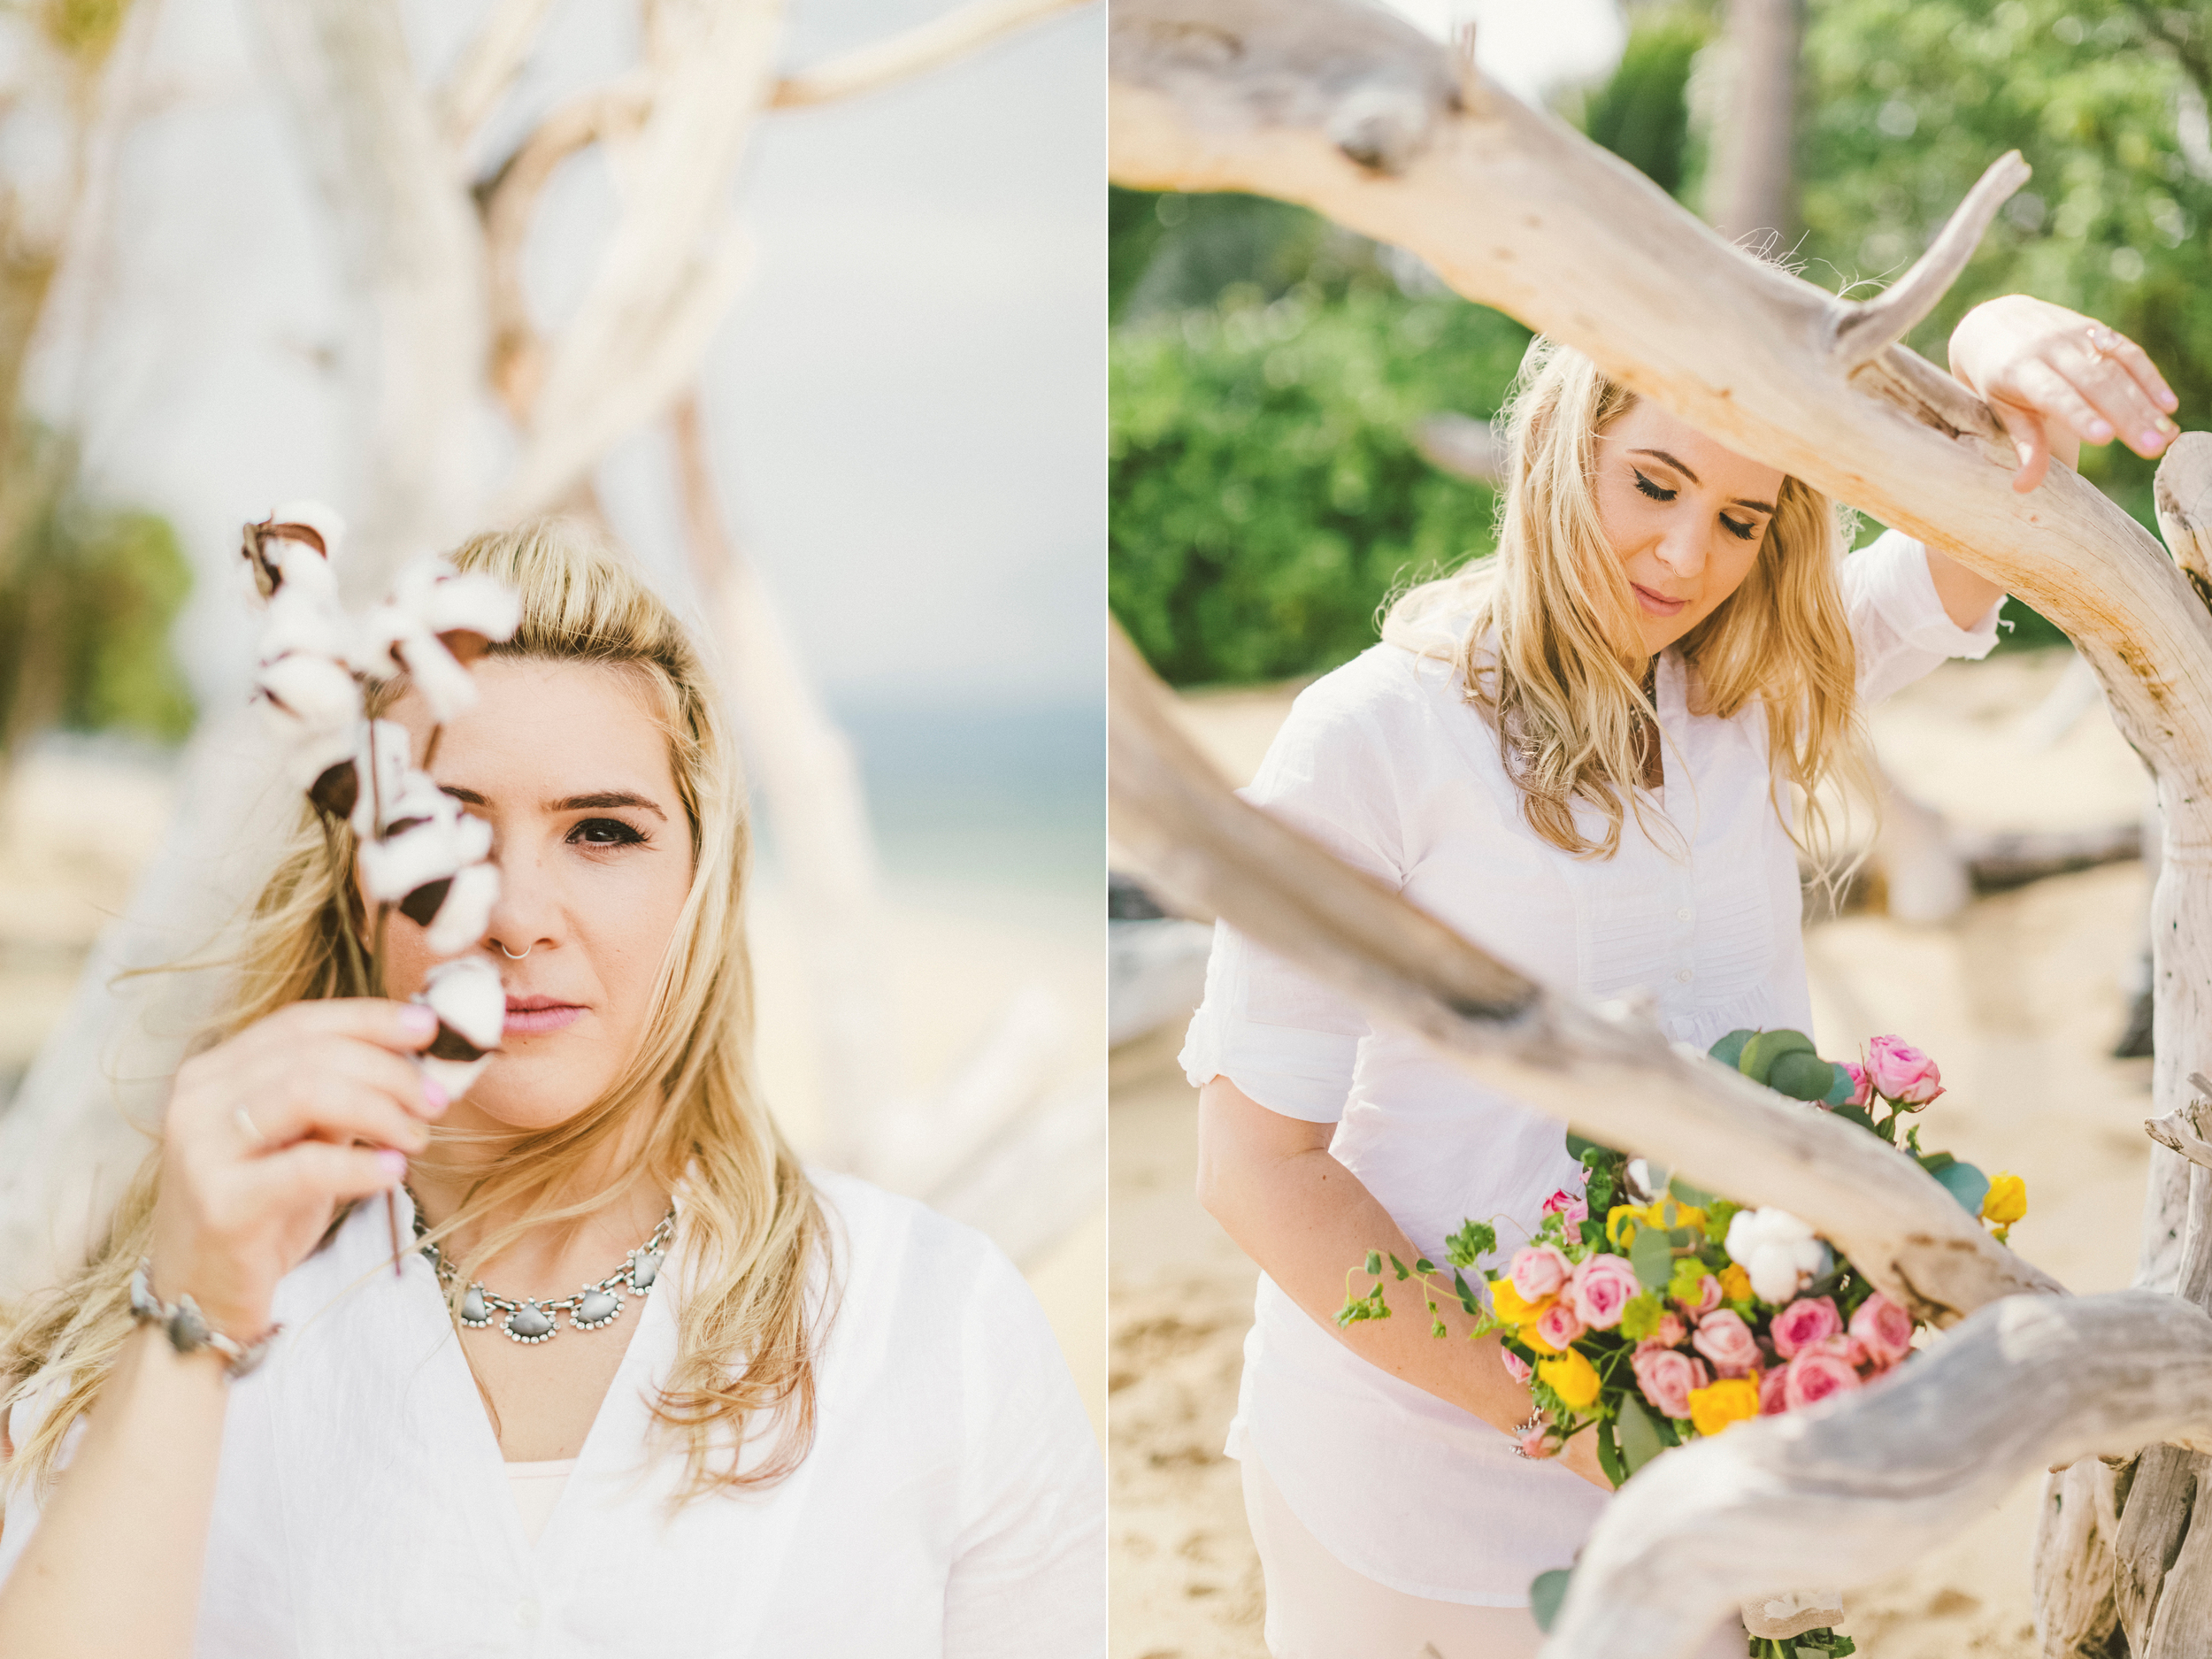 angie-diaz-photography-maui-wedding.jpg